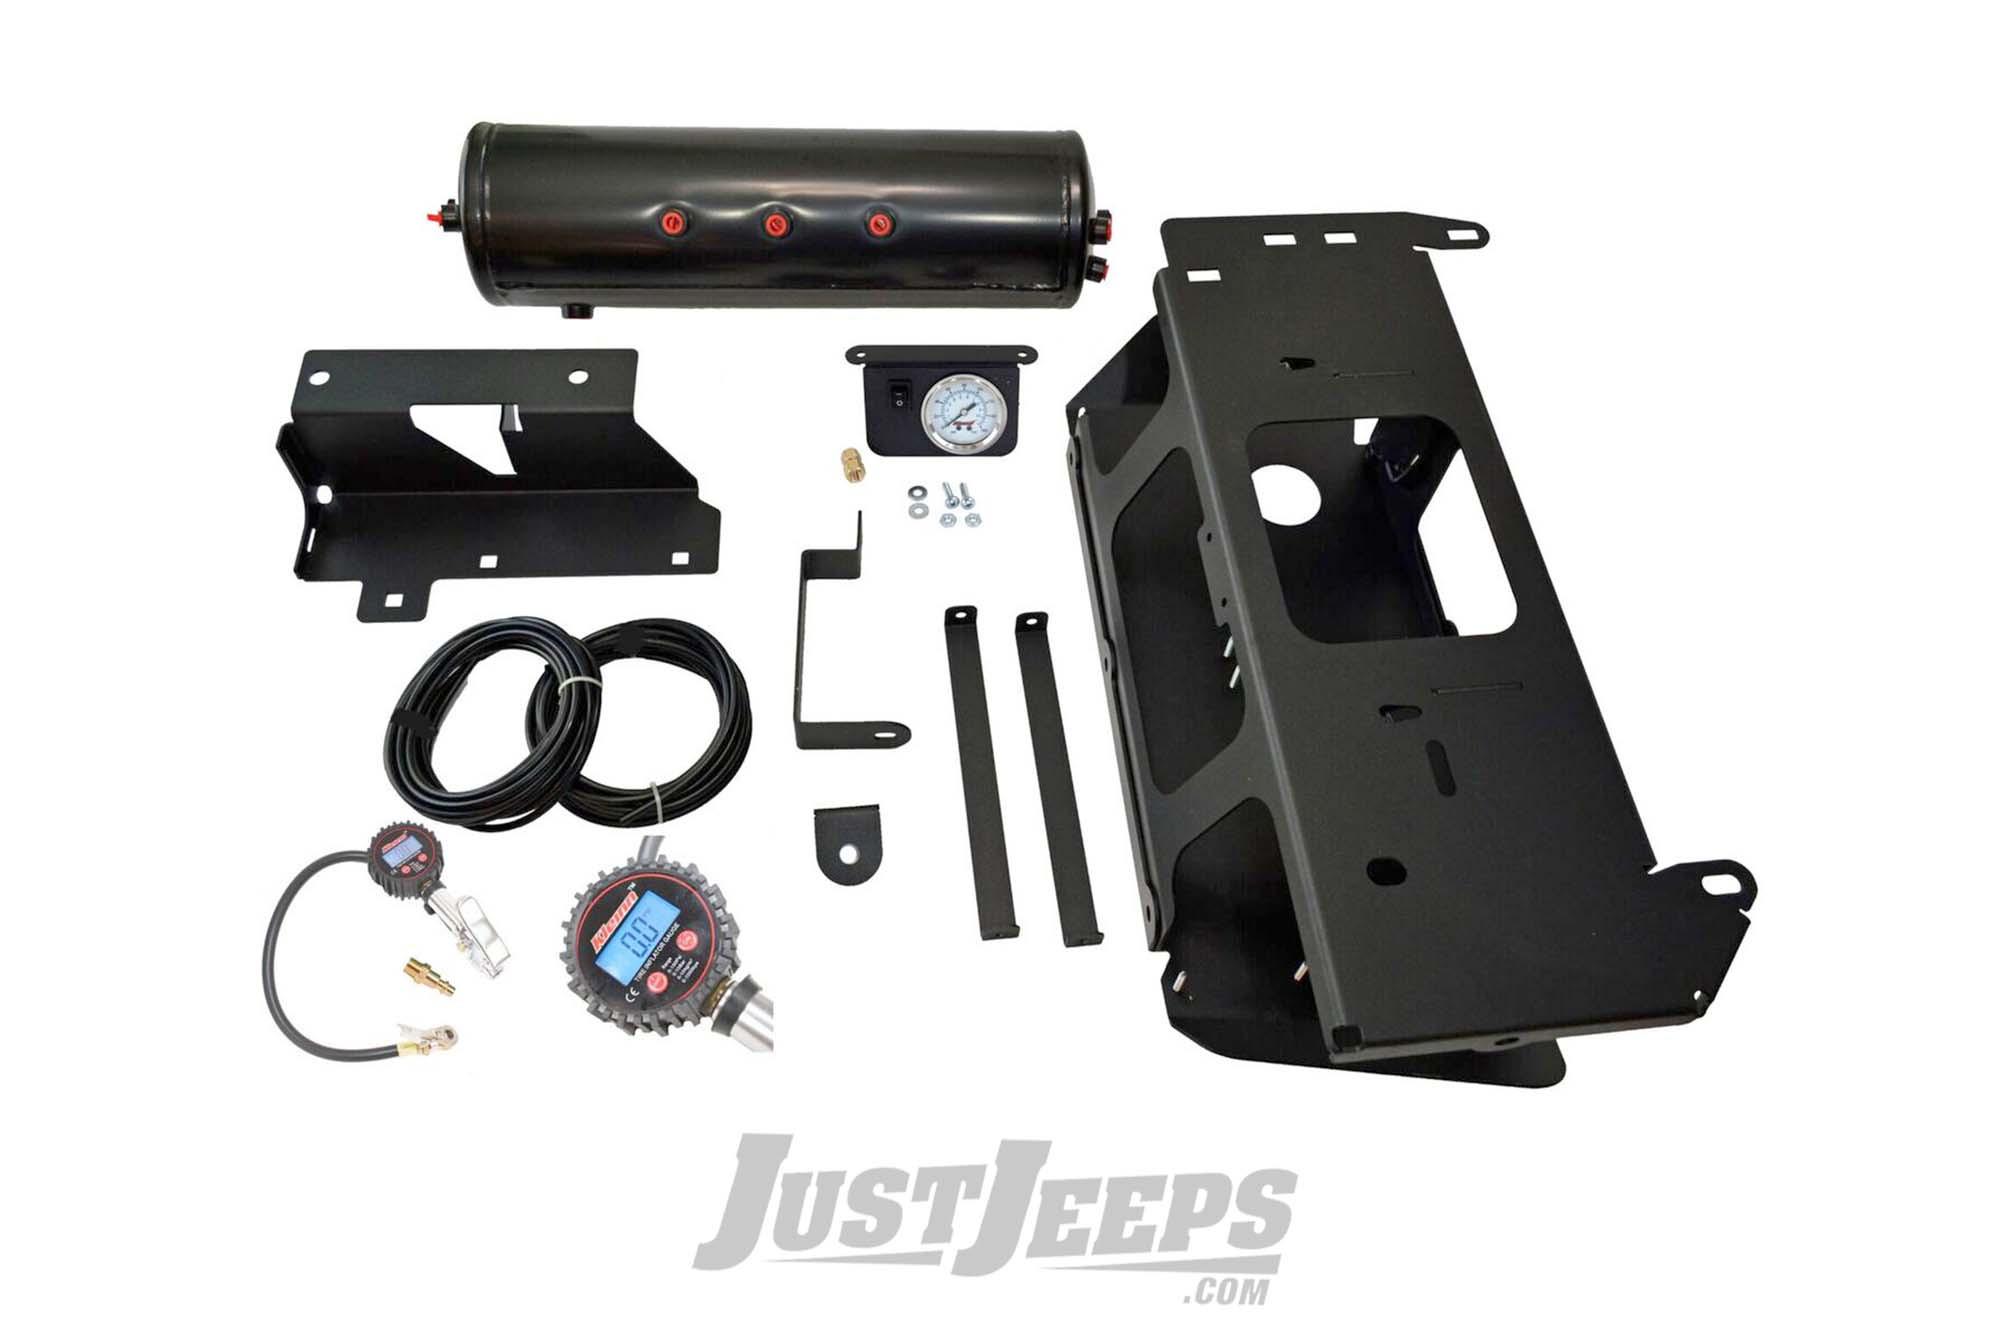 Kleinn Air Horns OnBoard Air System With Air Compressor & Tire Inflation Kit For 2018+ Jeep Wrangler JL Unlimited 4 Door Models JL-JK-OBA